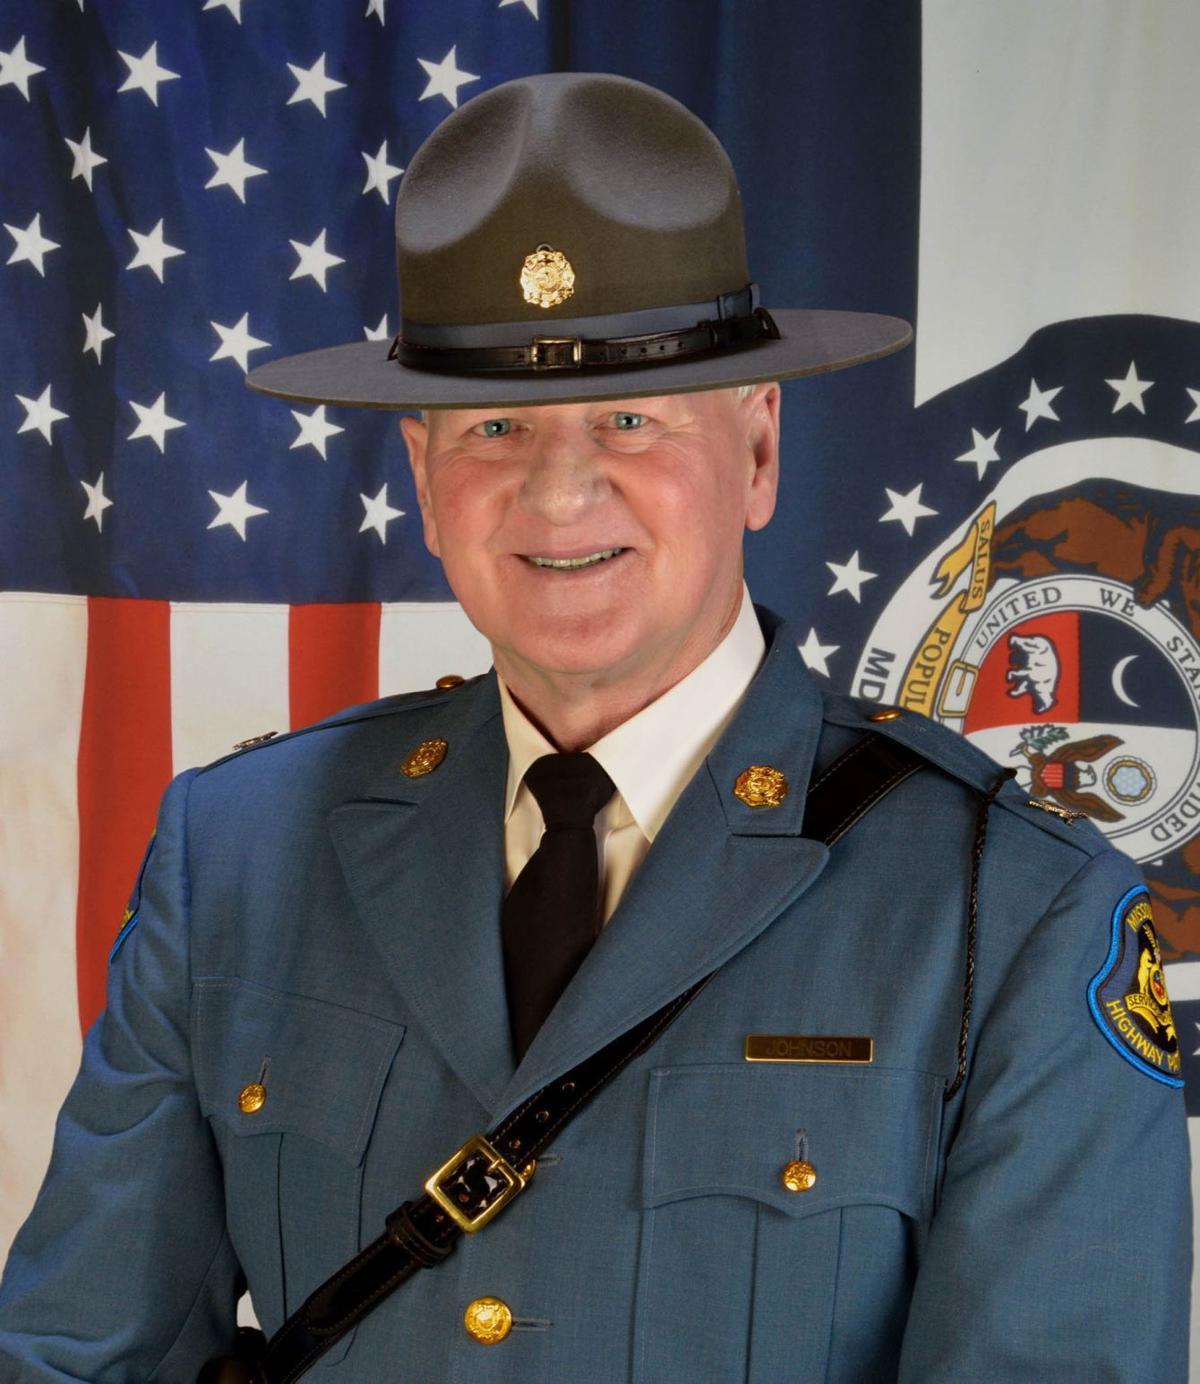 Missouri Highway Patrol Superintendent Col. Bret Johnson